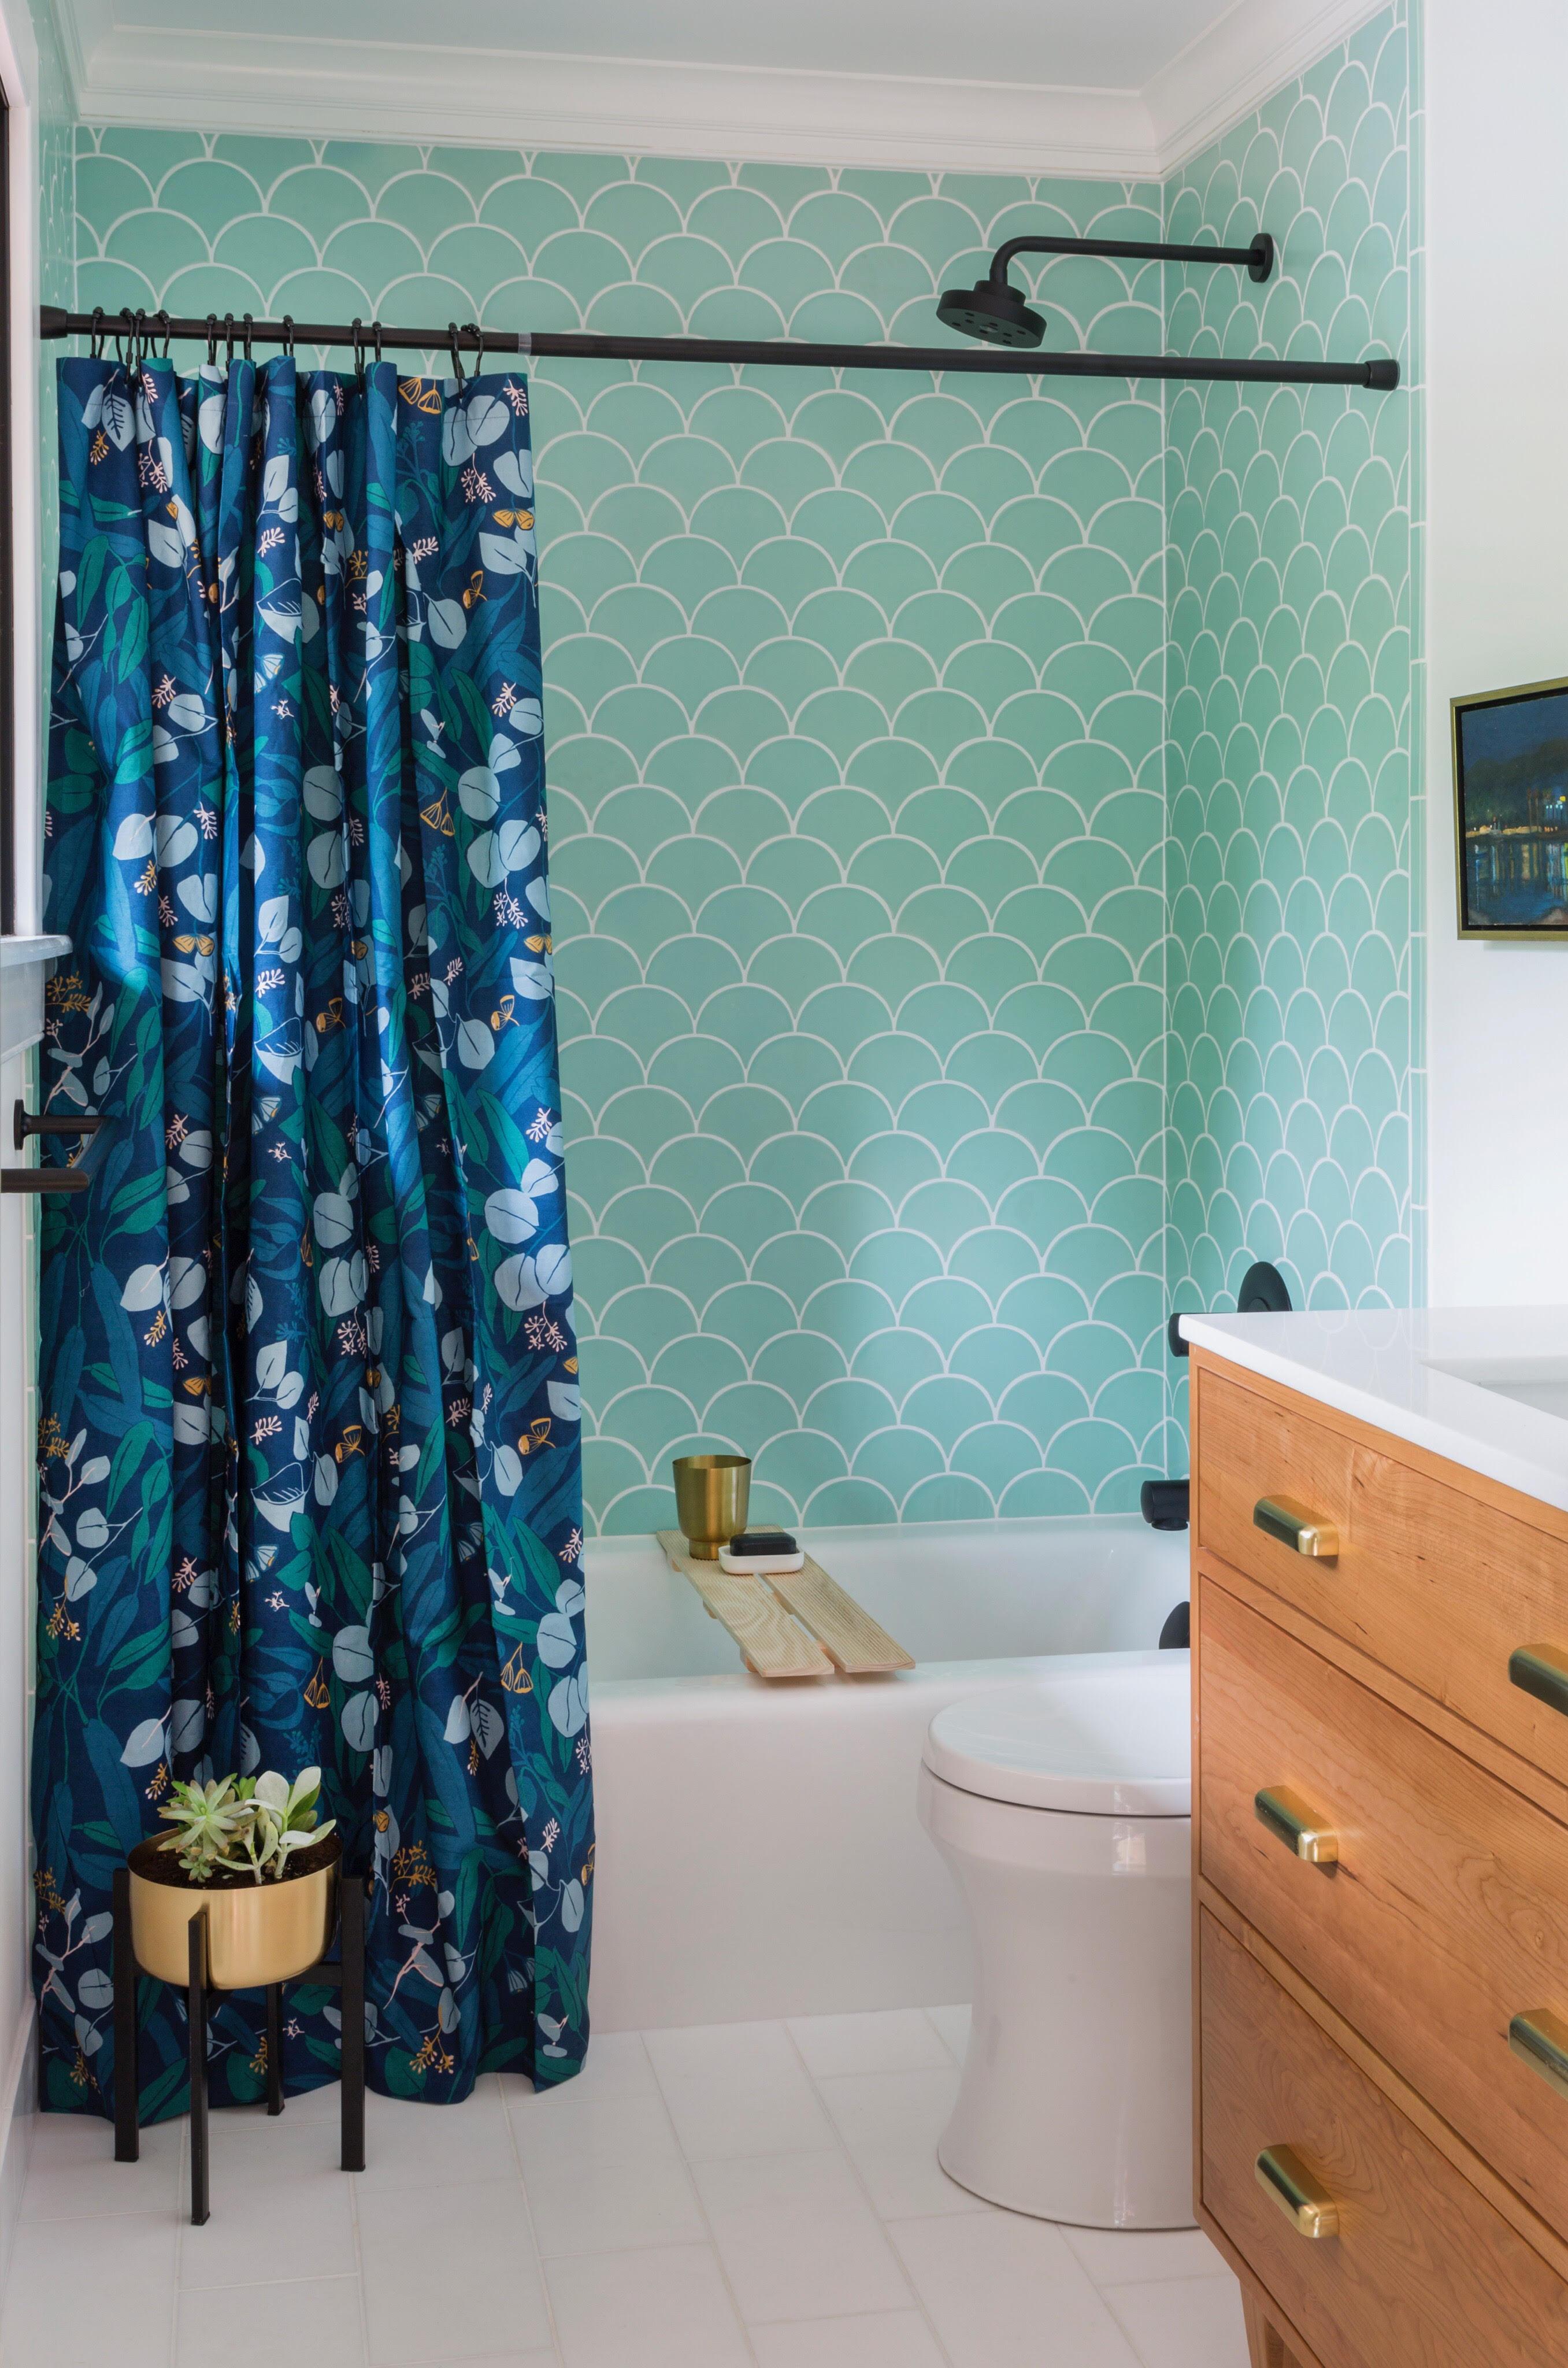 2017_q3_image_residential_bathroom_shower_ogee_drop_moonstone_1.jpg